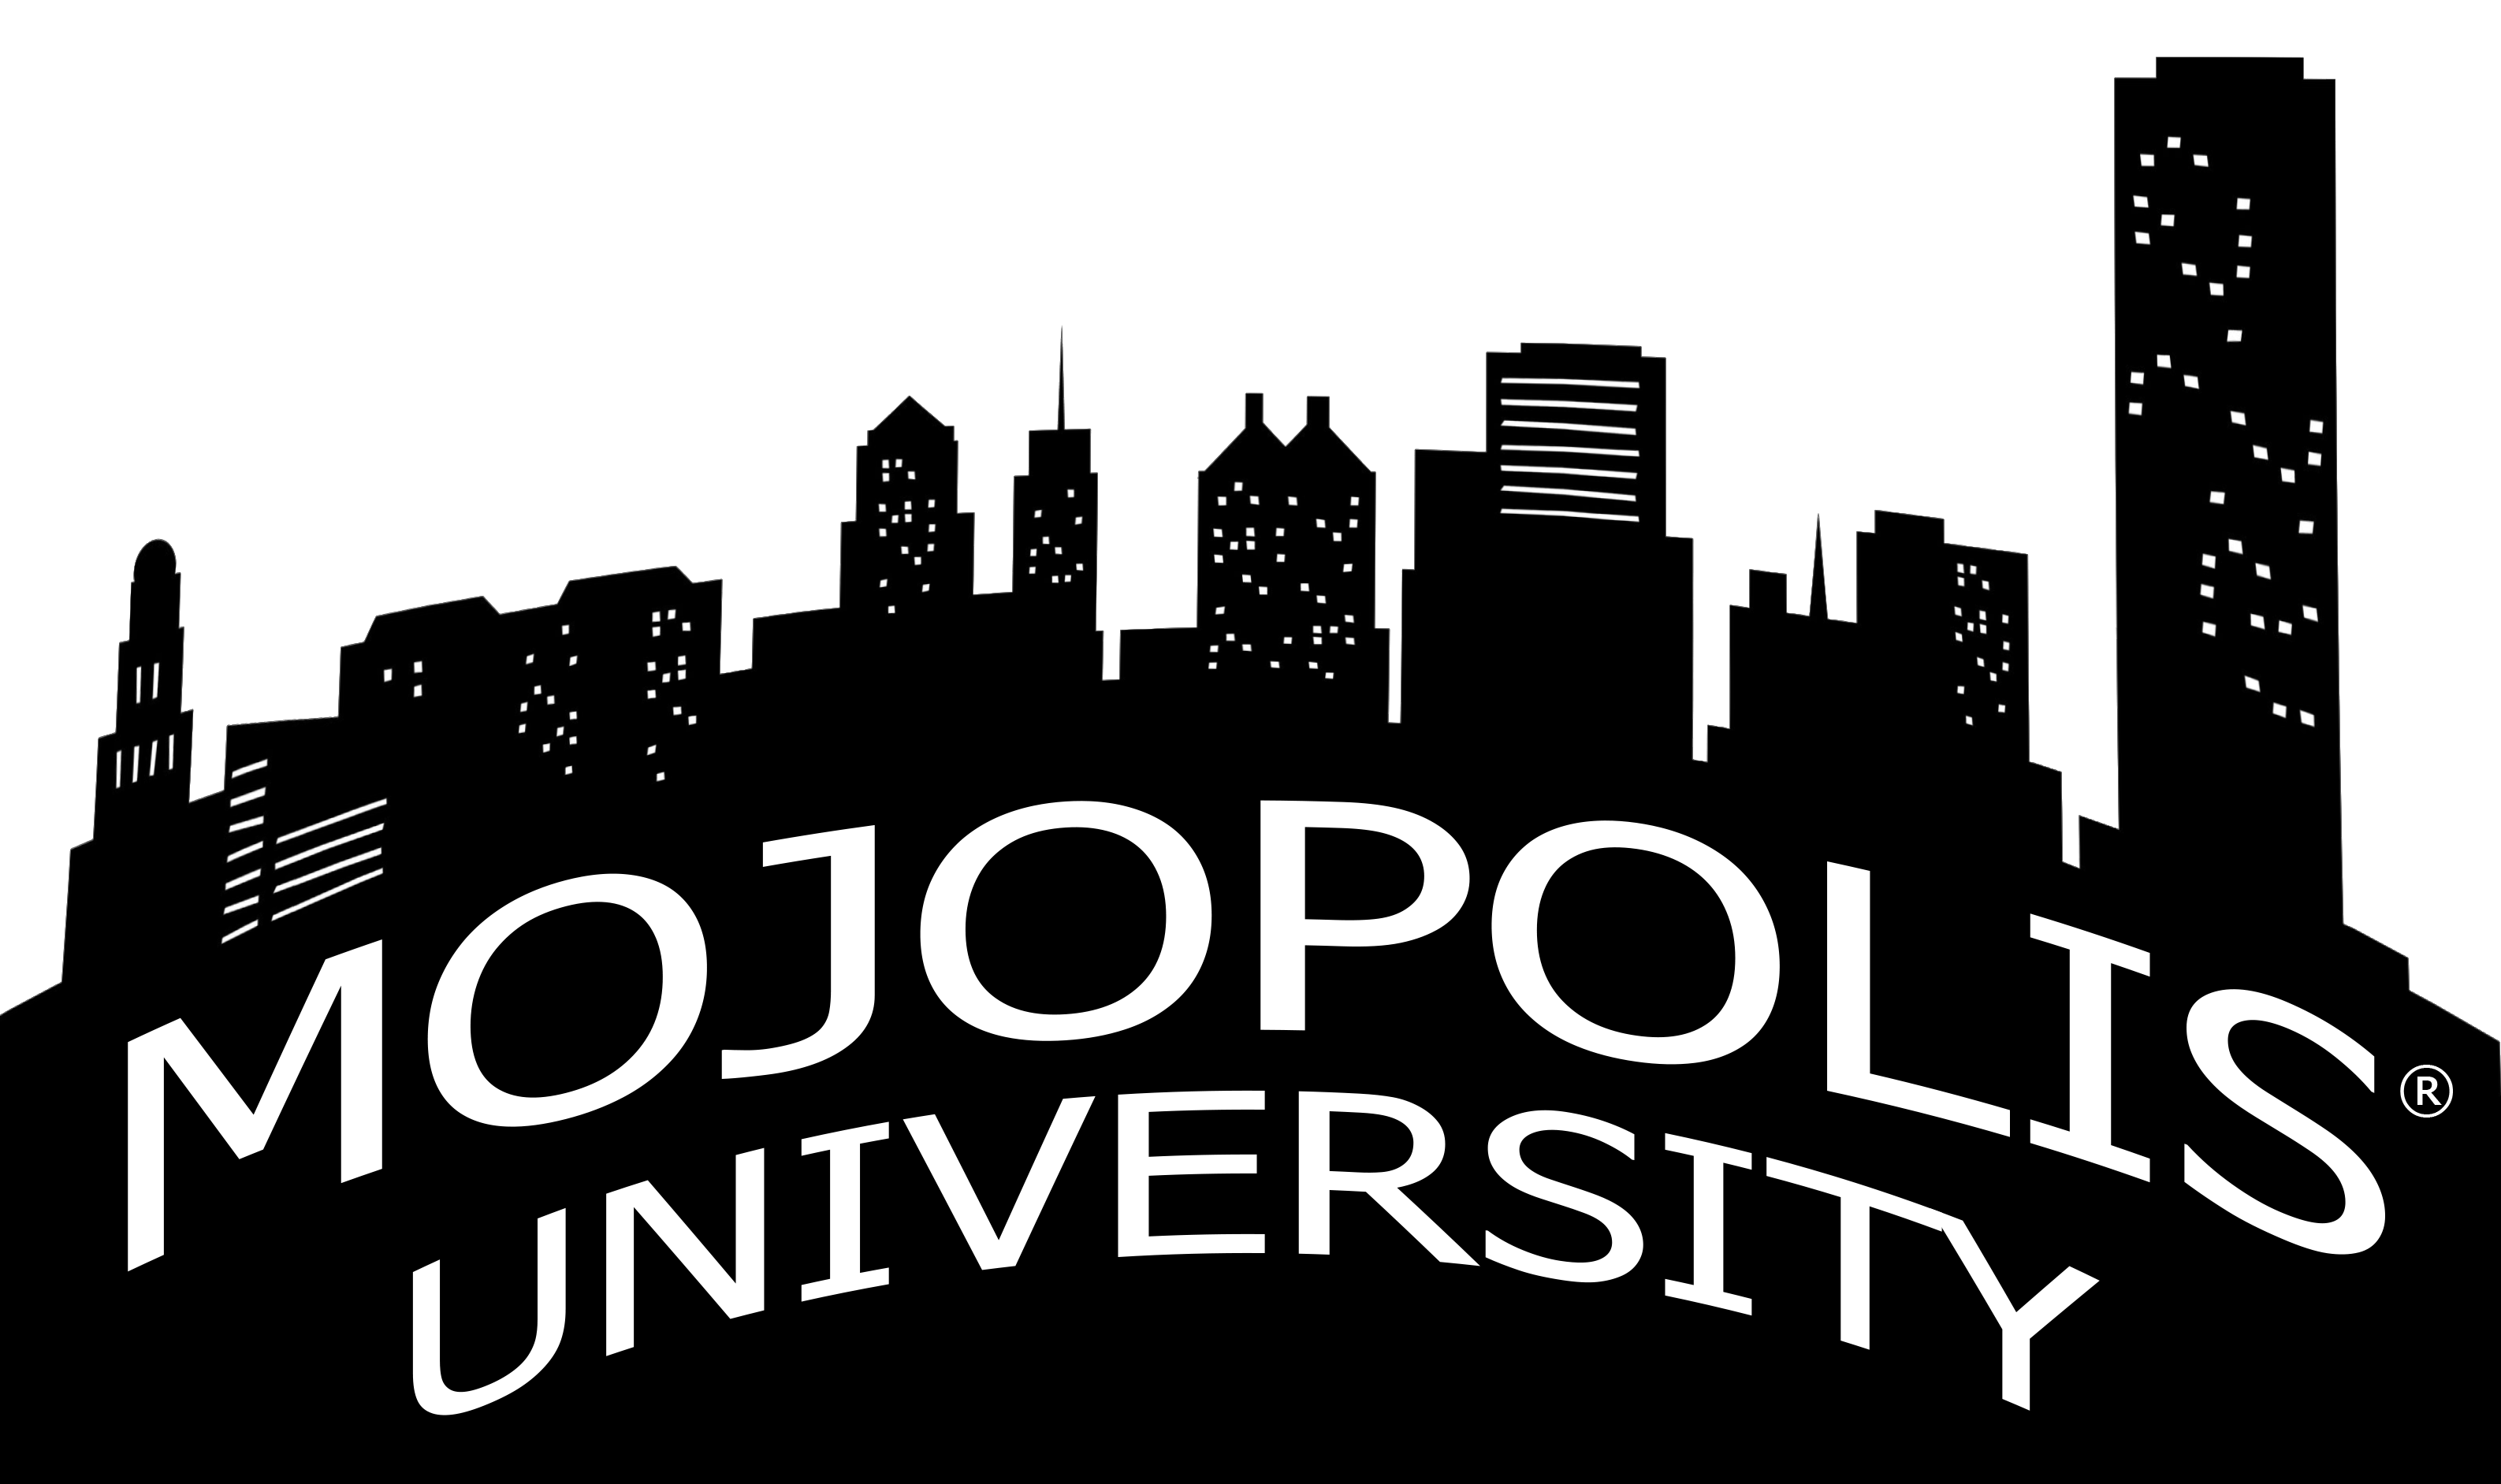 Mojopolis University